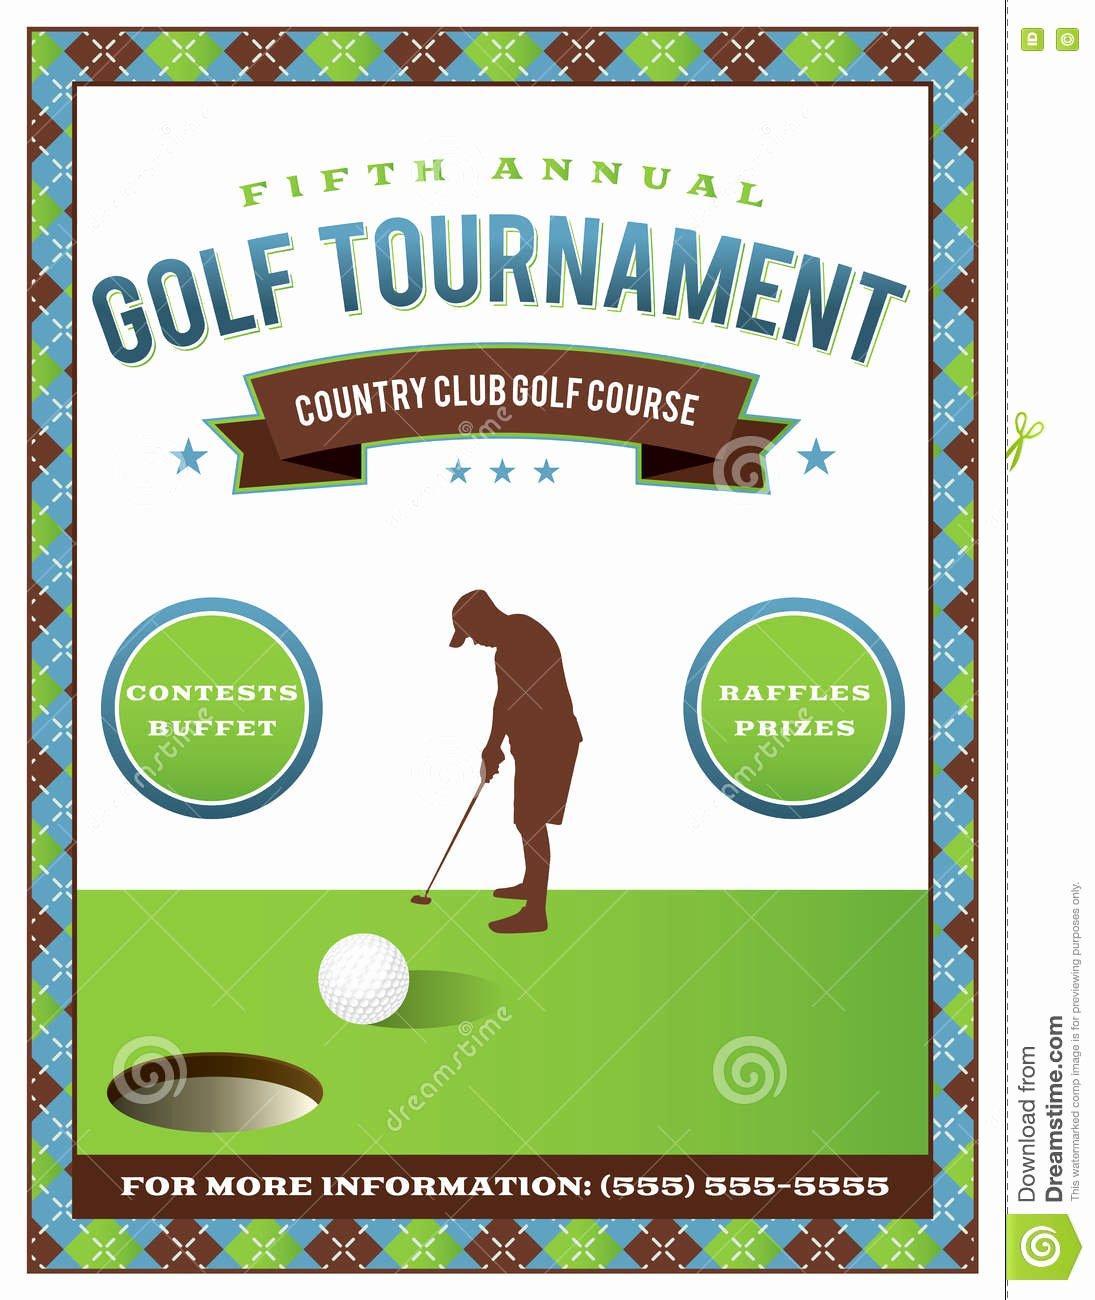 Golf tournament Flyers Template Elegant Golf tournament Flyer Template Stock Vector Illustration